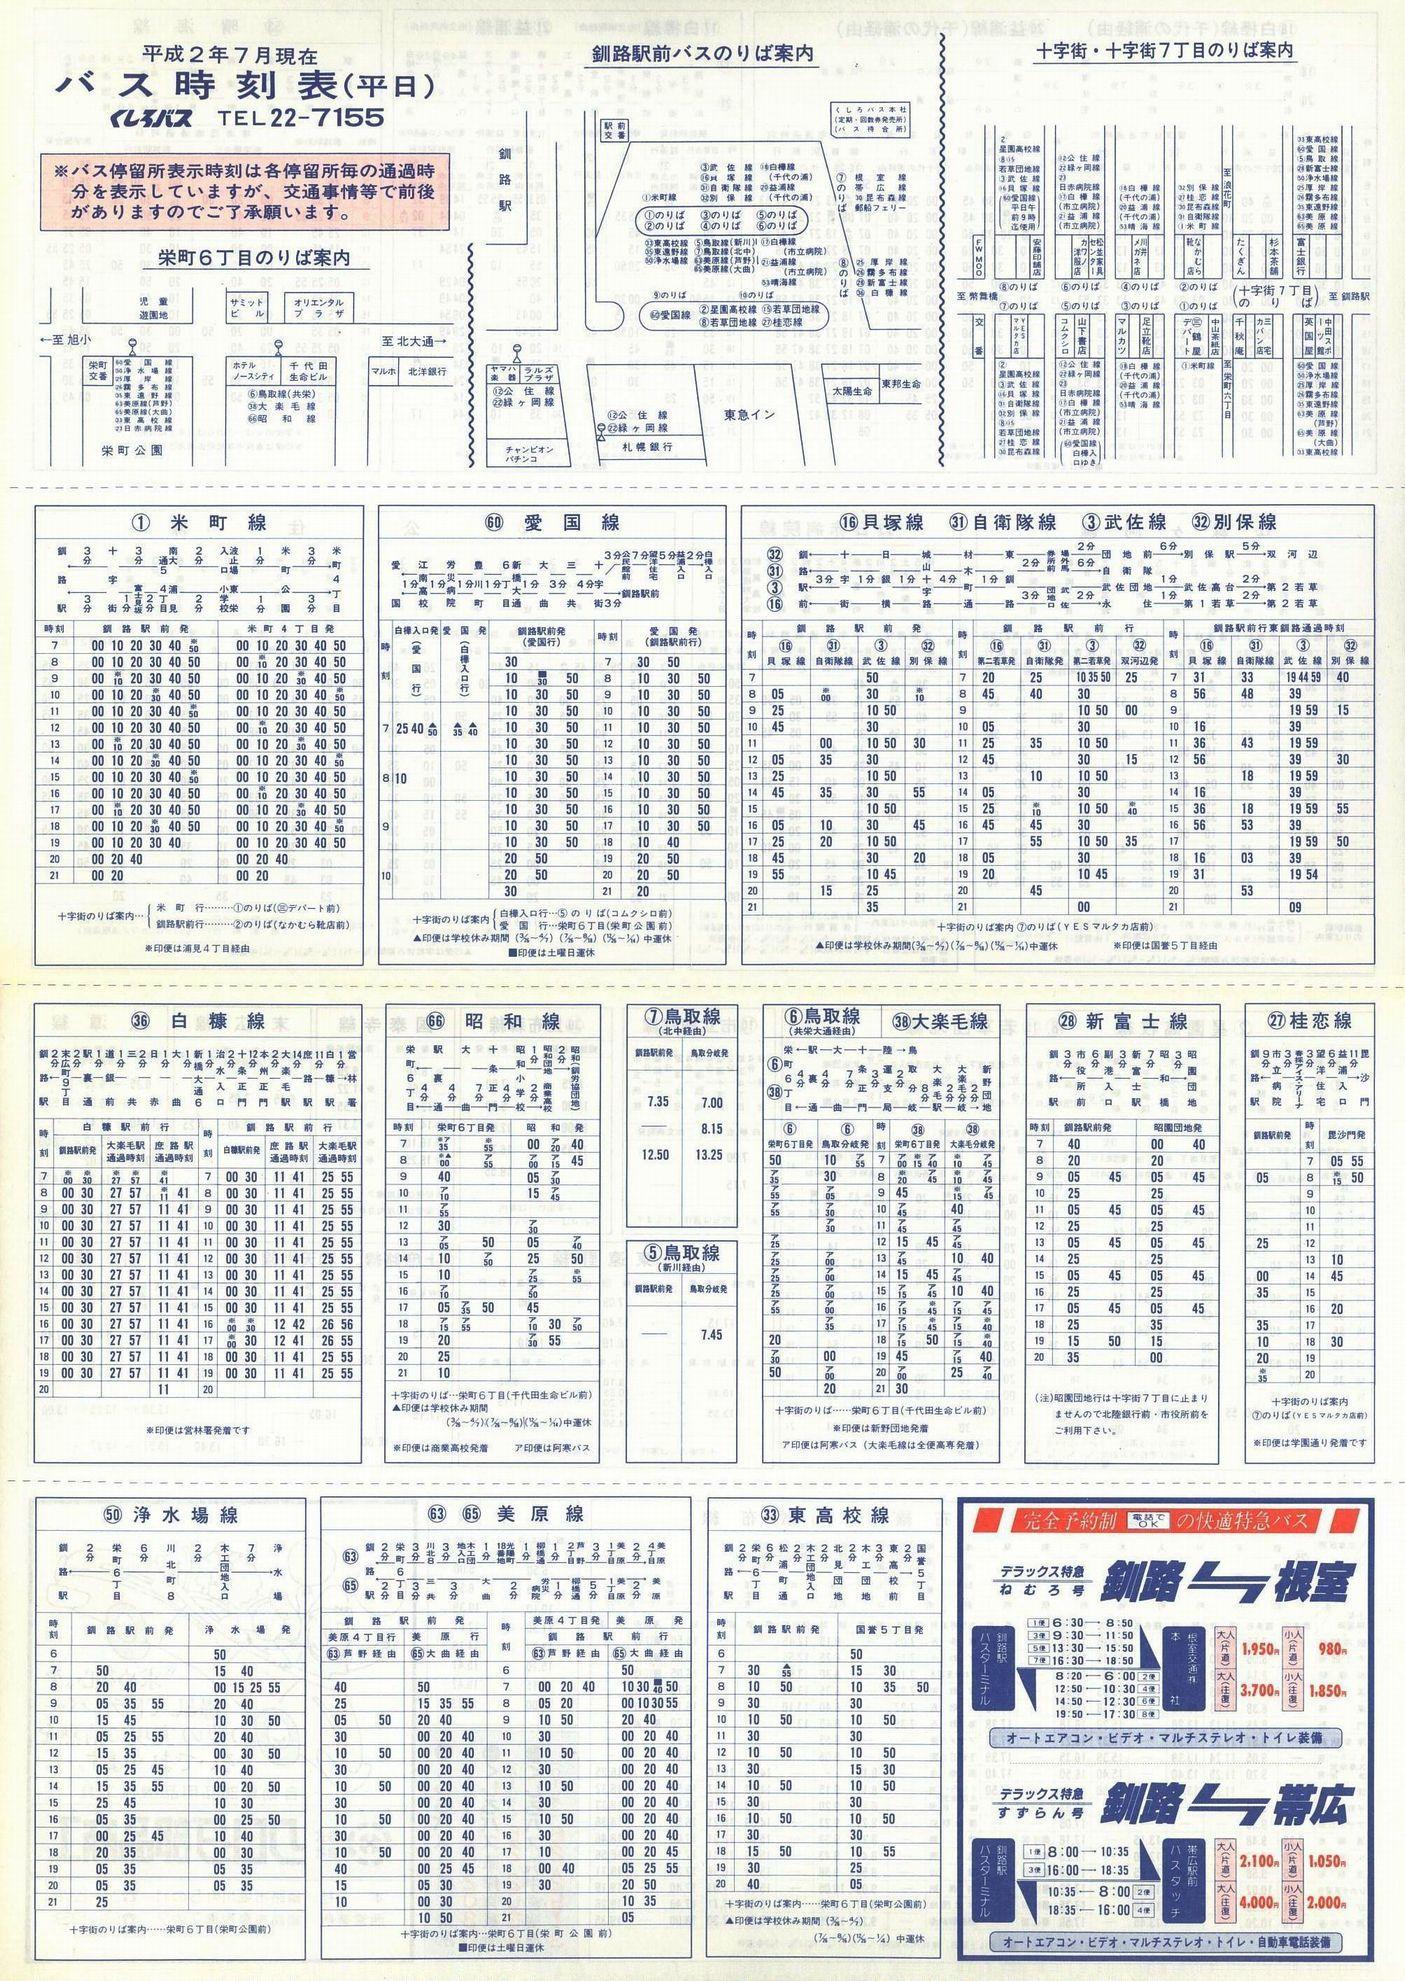 バス 図 釧路 路線